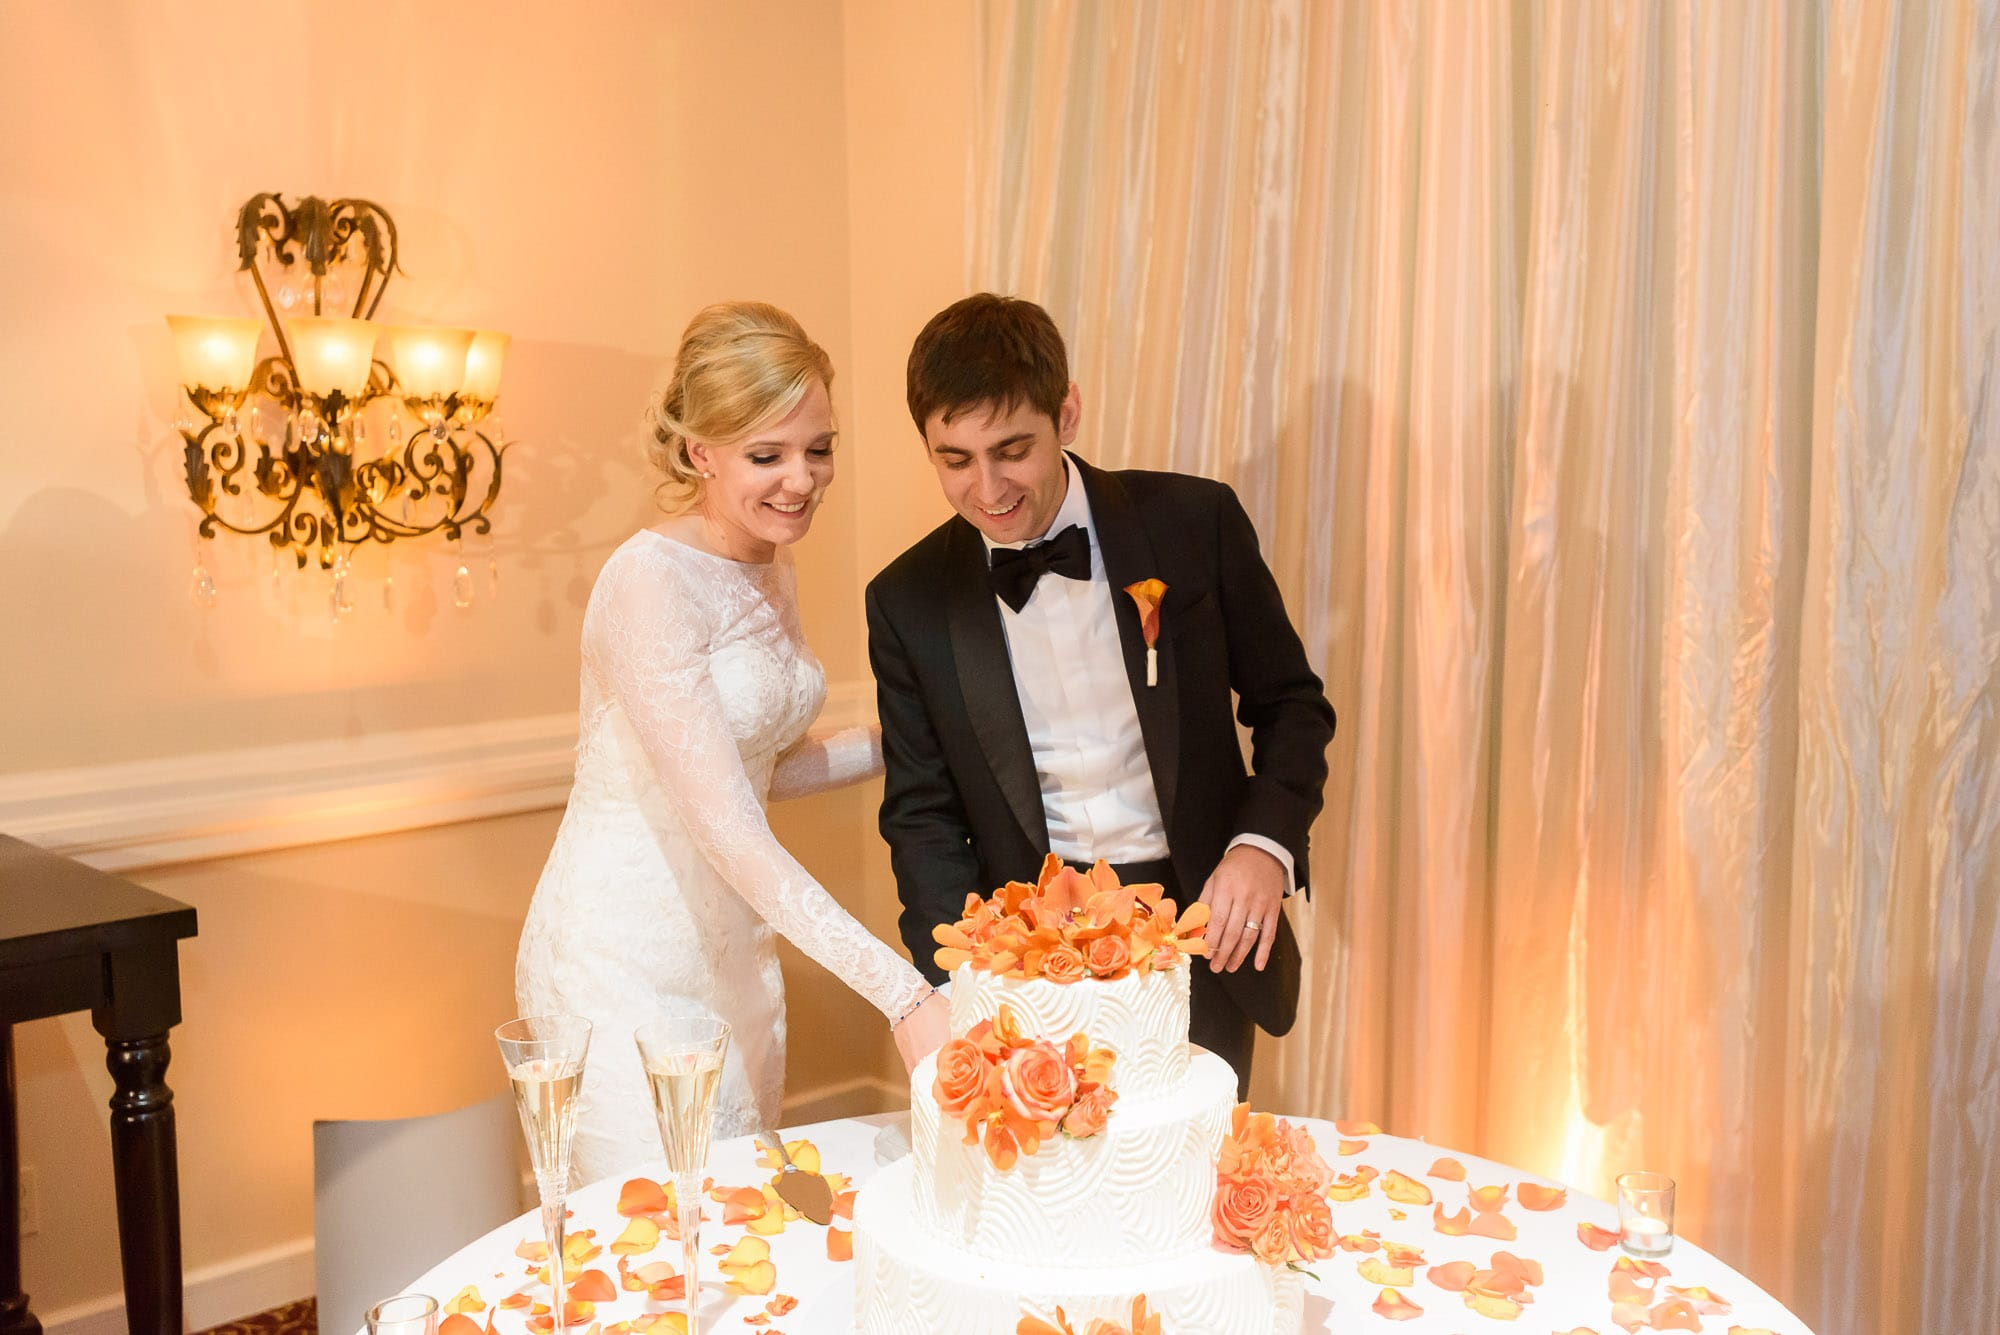 071_Alan_and_Heidi_Los_Angeles_Equestrian_Center_Wedding